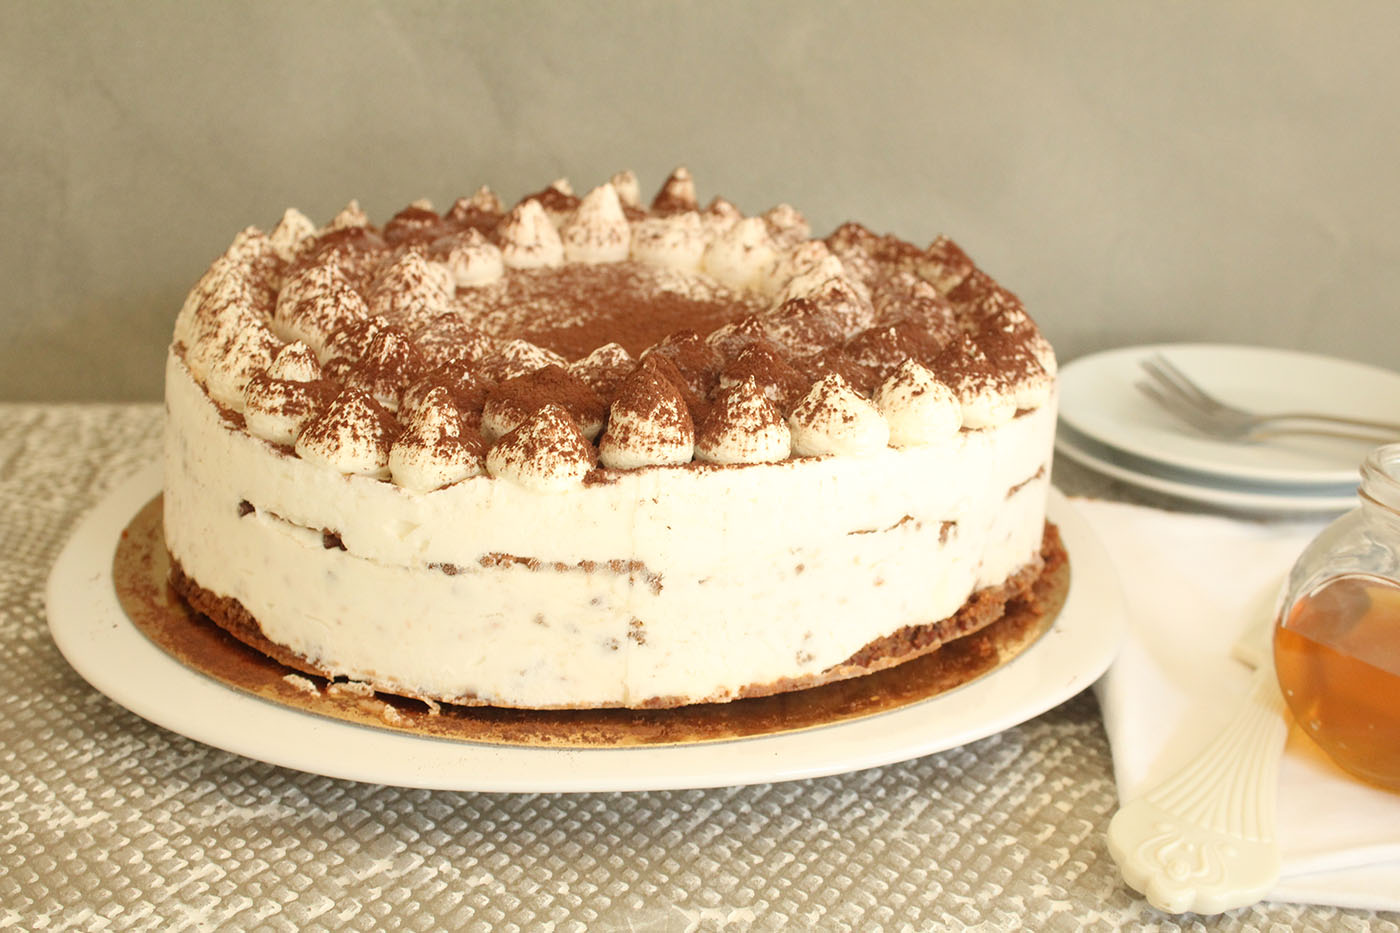 IMG 9737 - עוגת טרימיסו דבש ופקאן